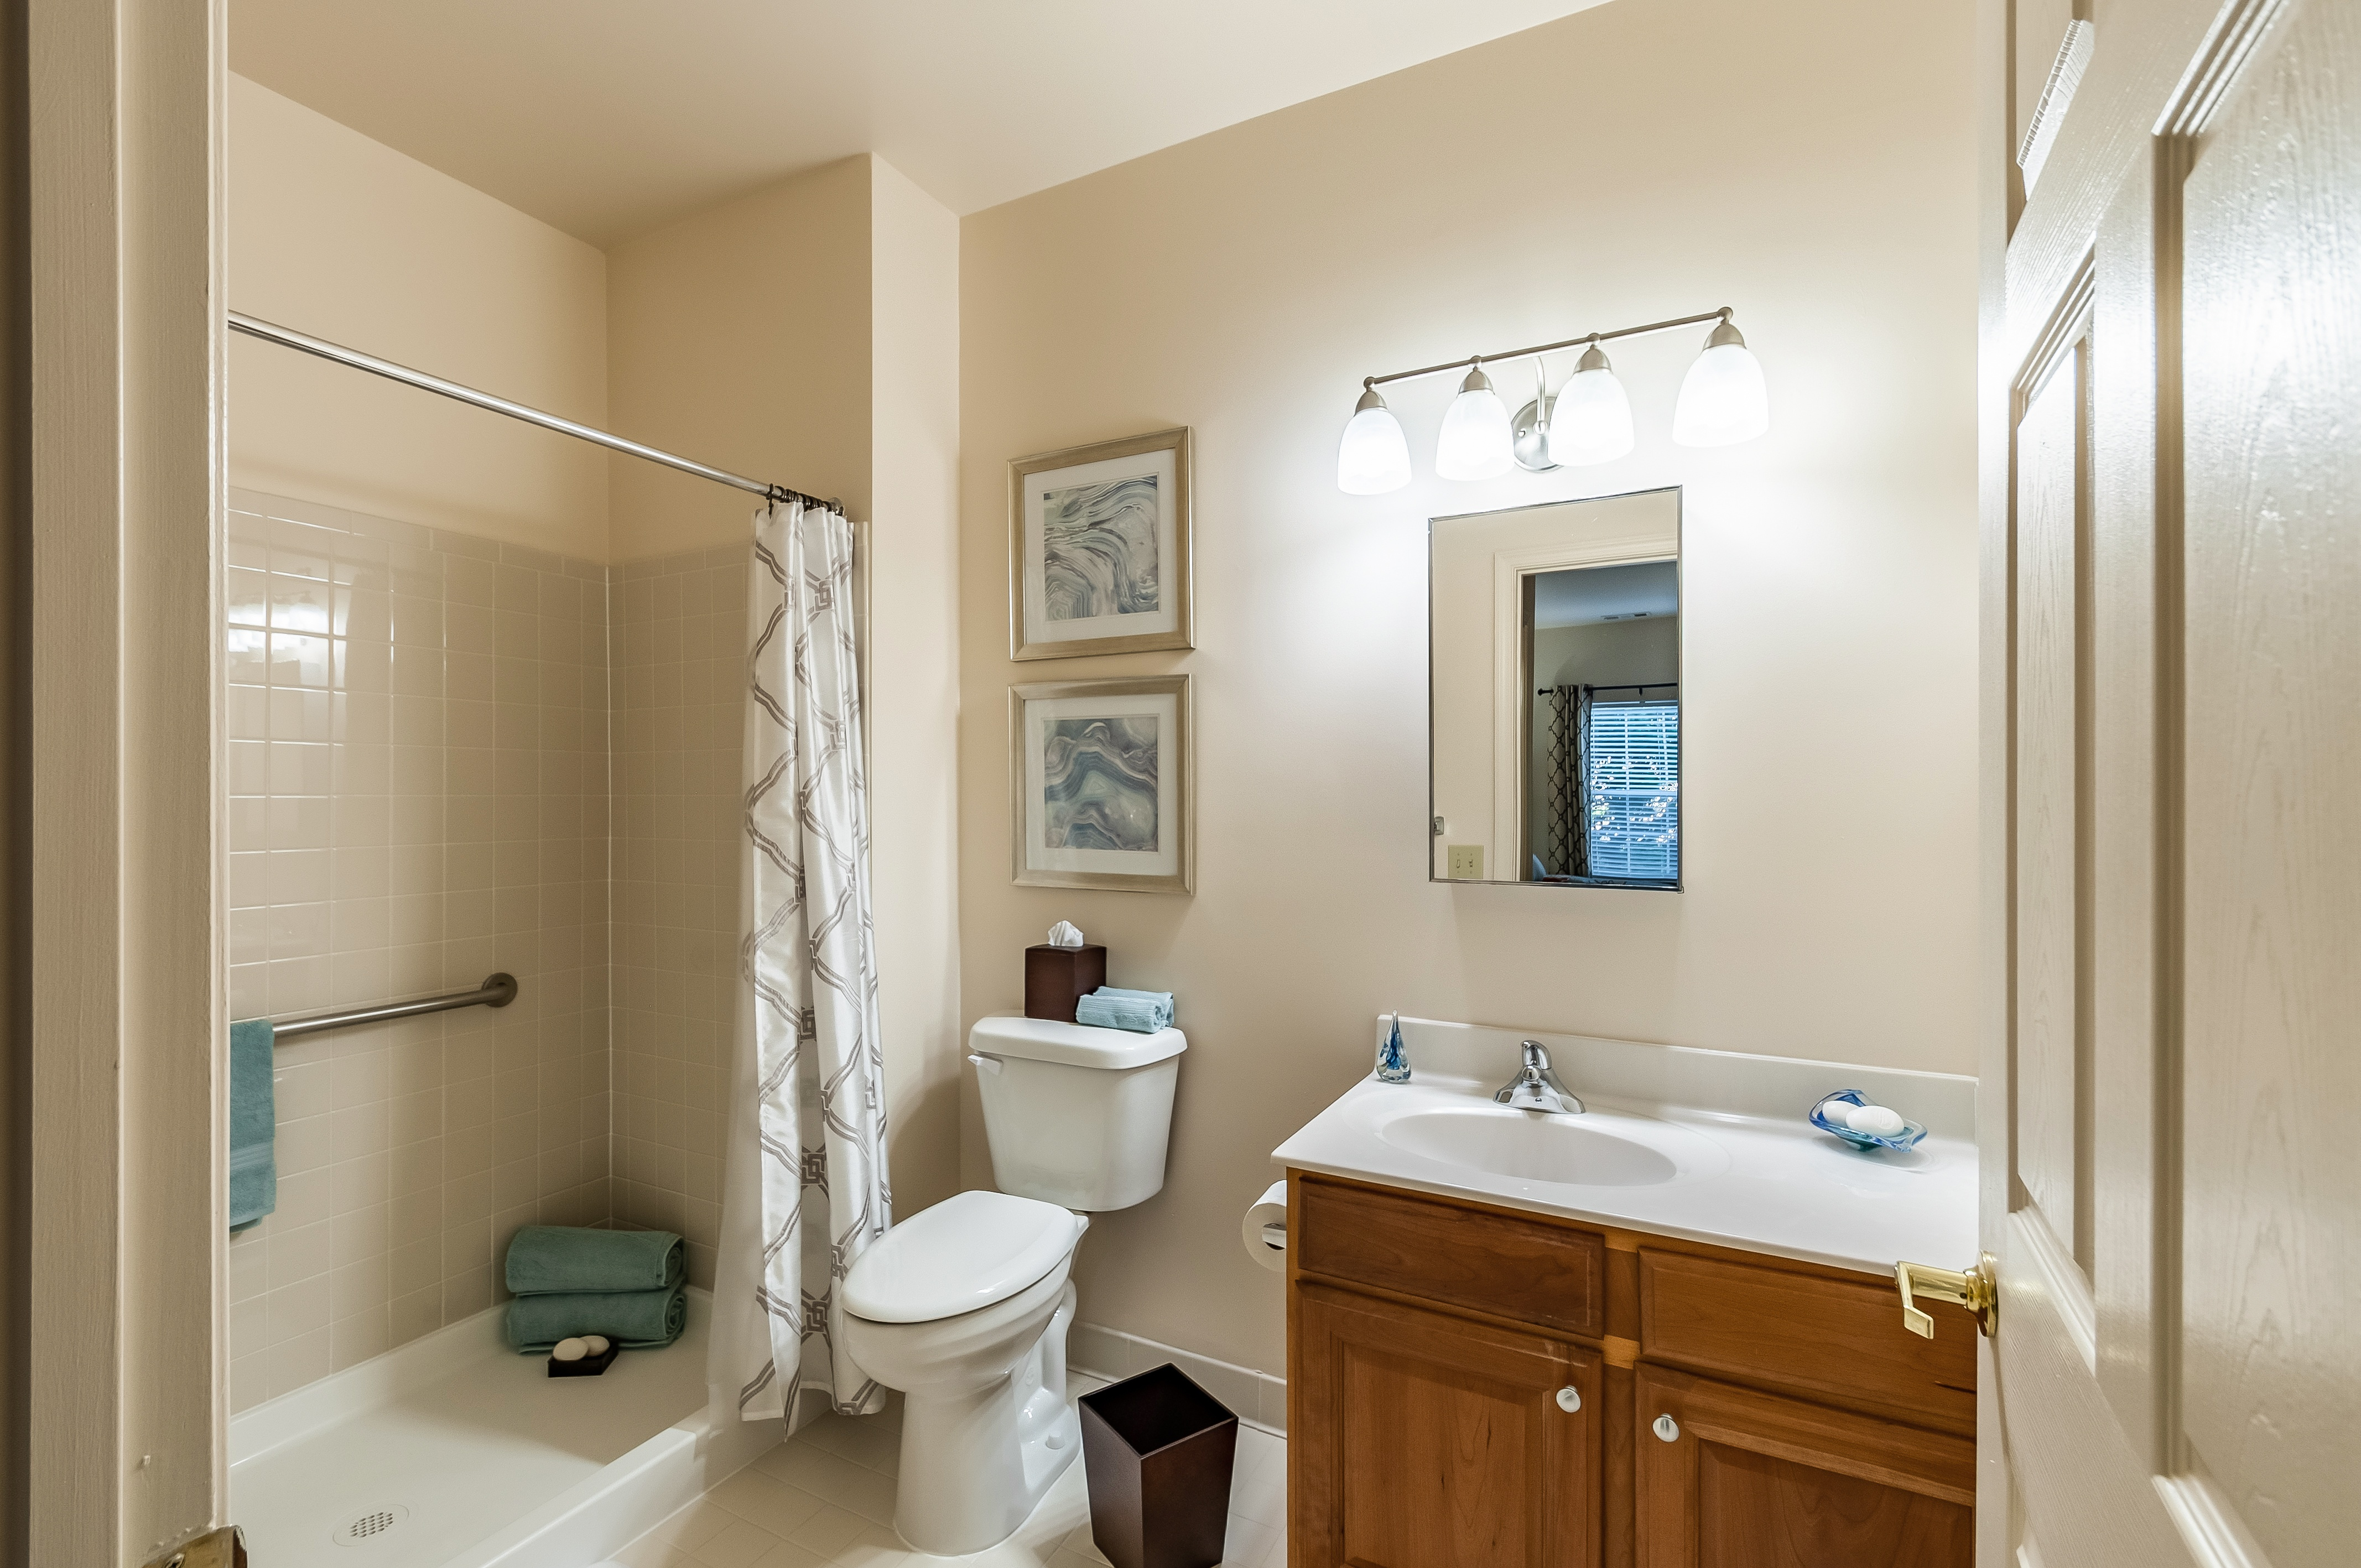 arbor-terrace-of-herndon-Master-Bathroom